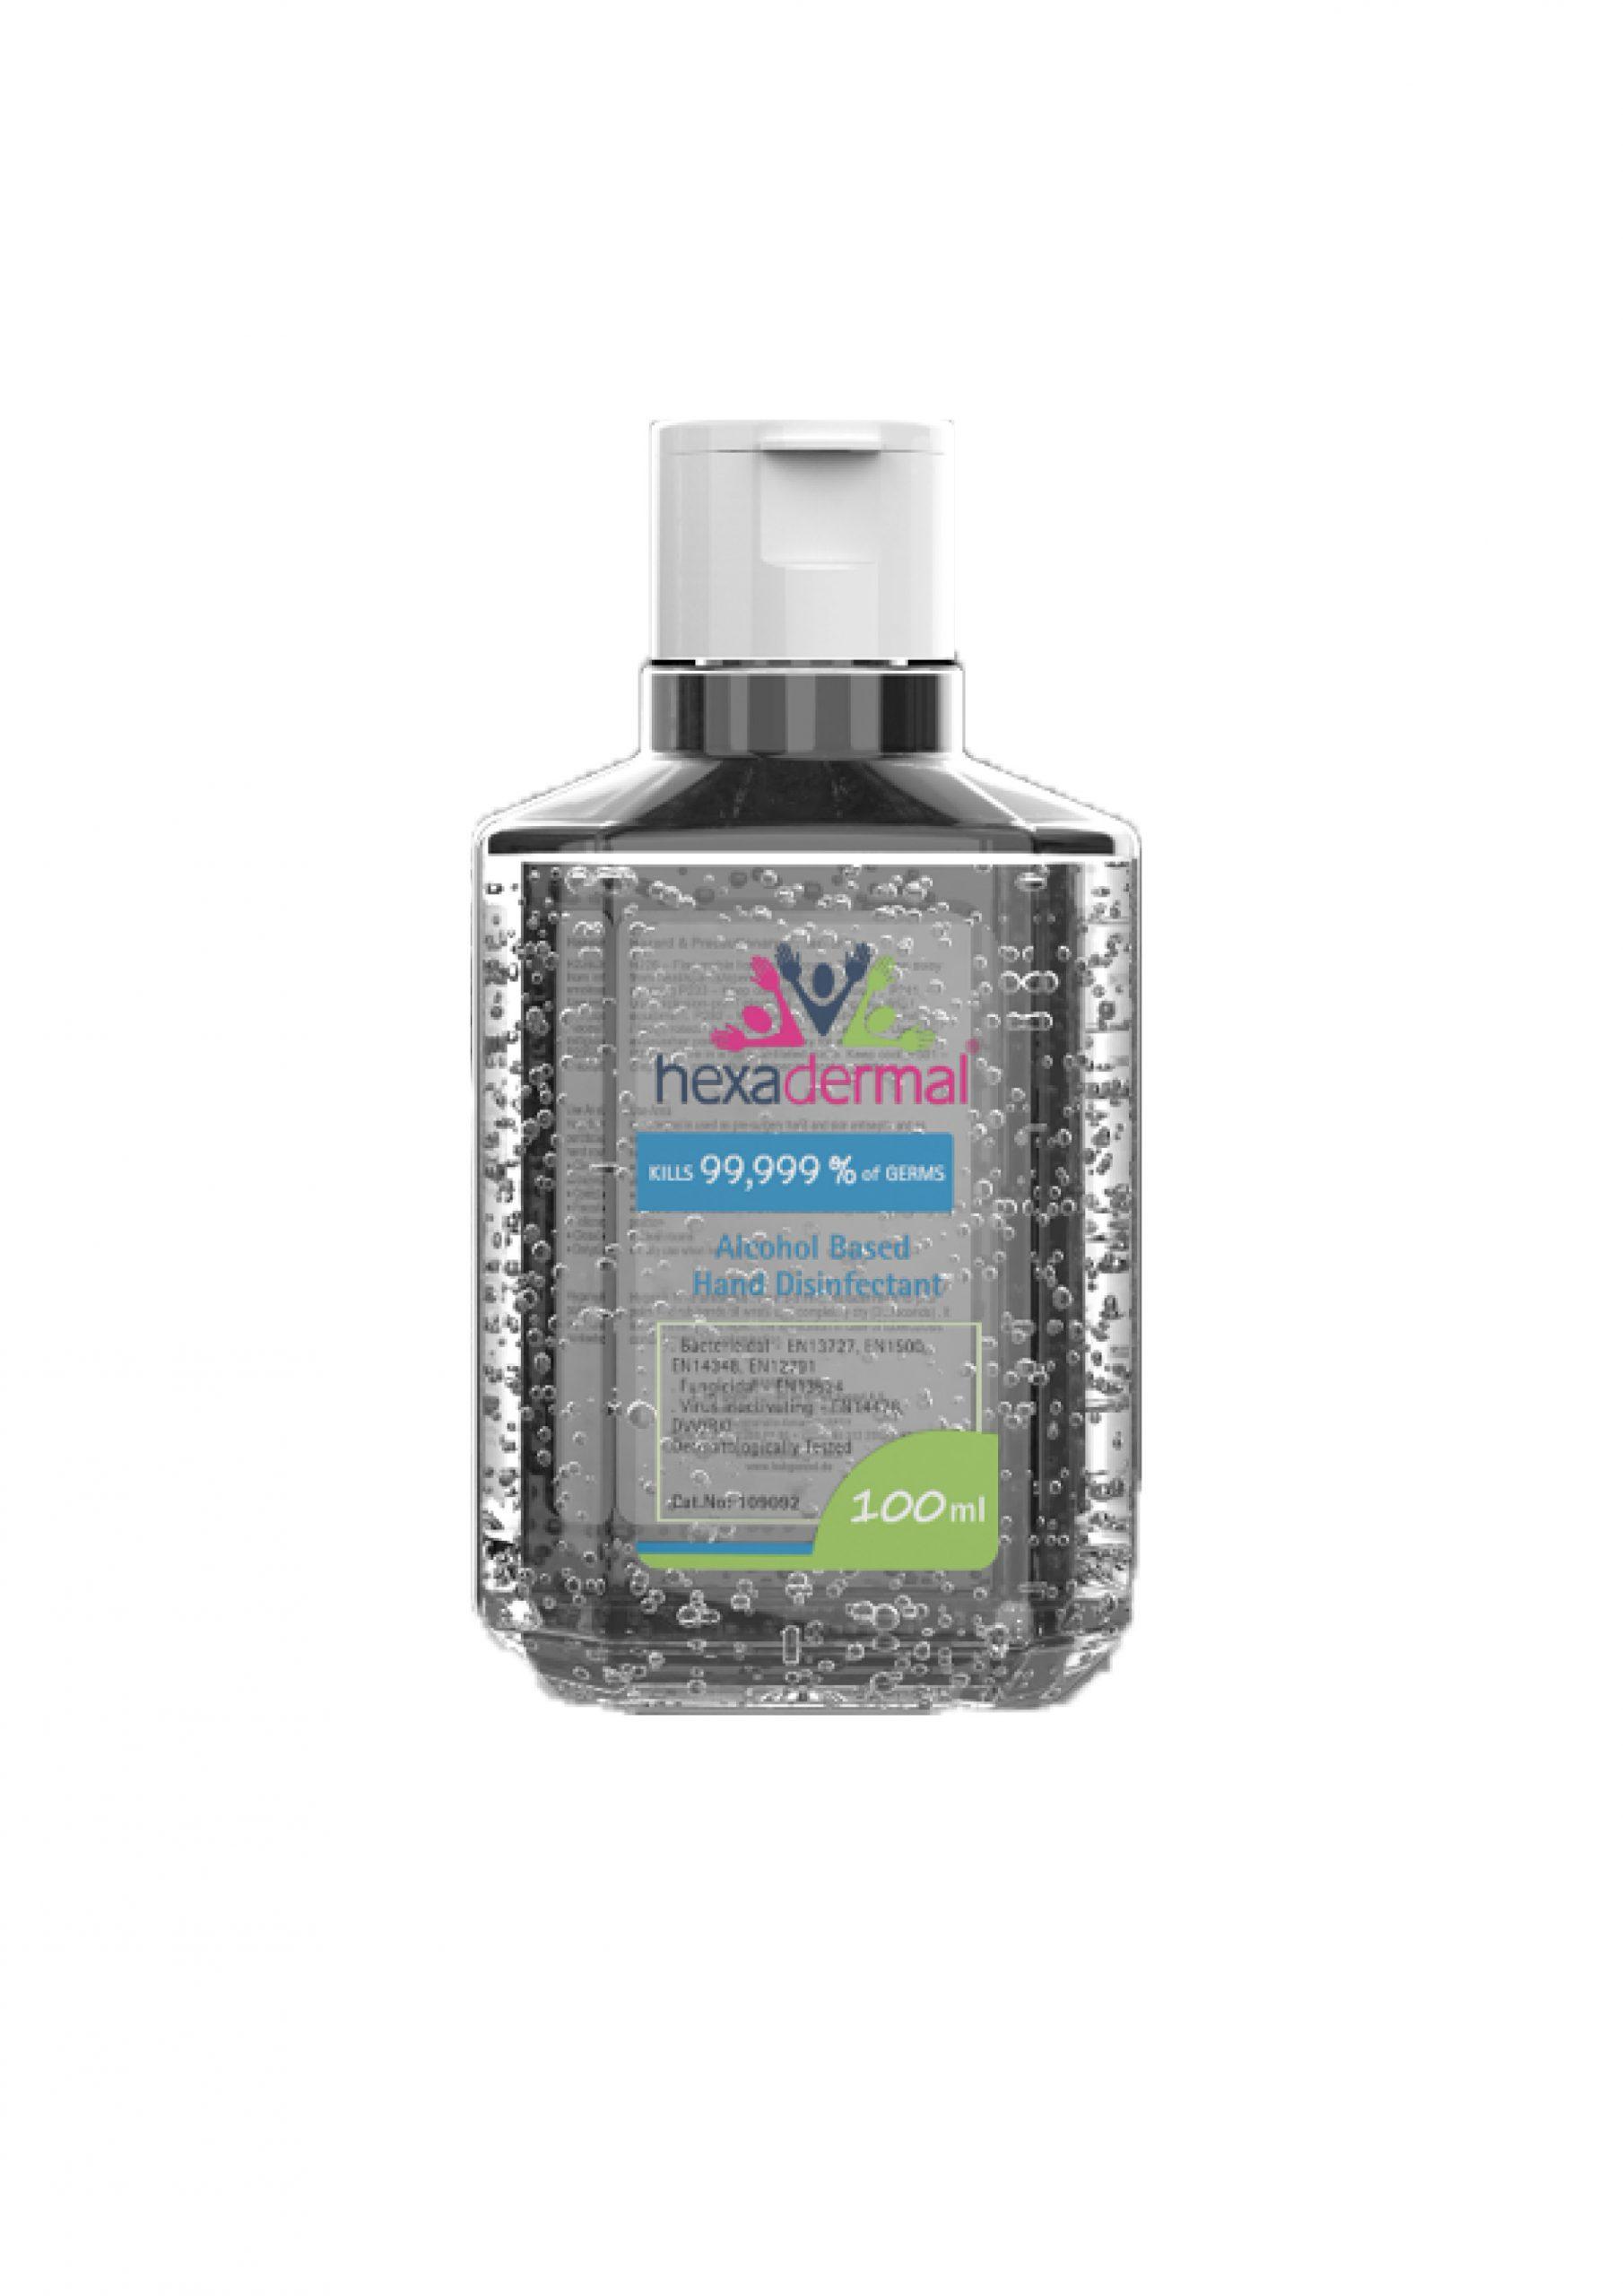 Hexadermal Alcohol Based Gel Hand Sanitizer